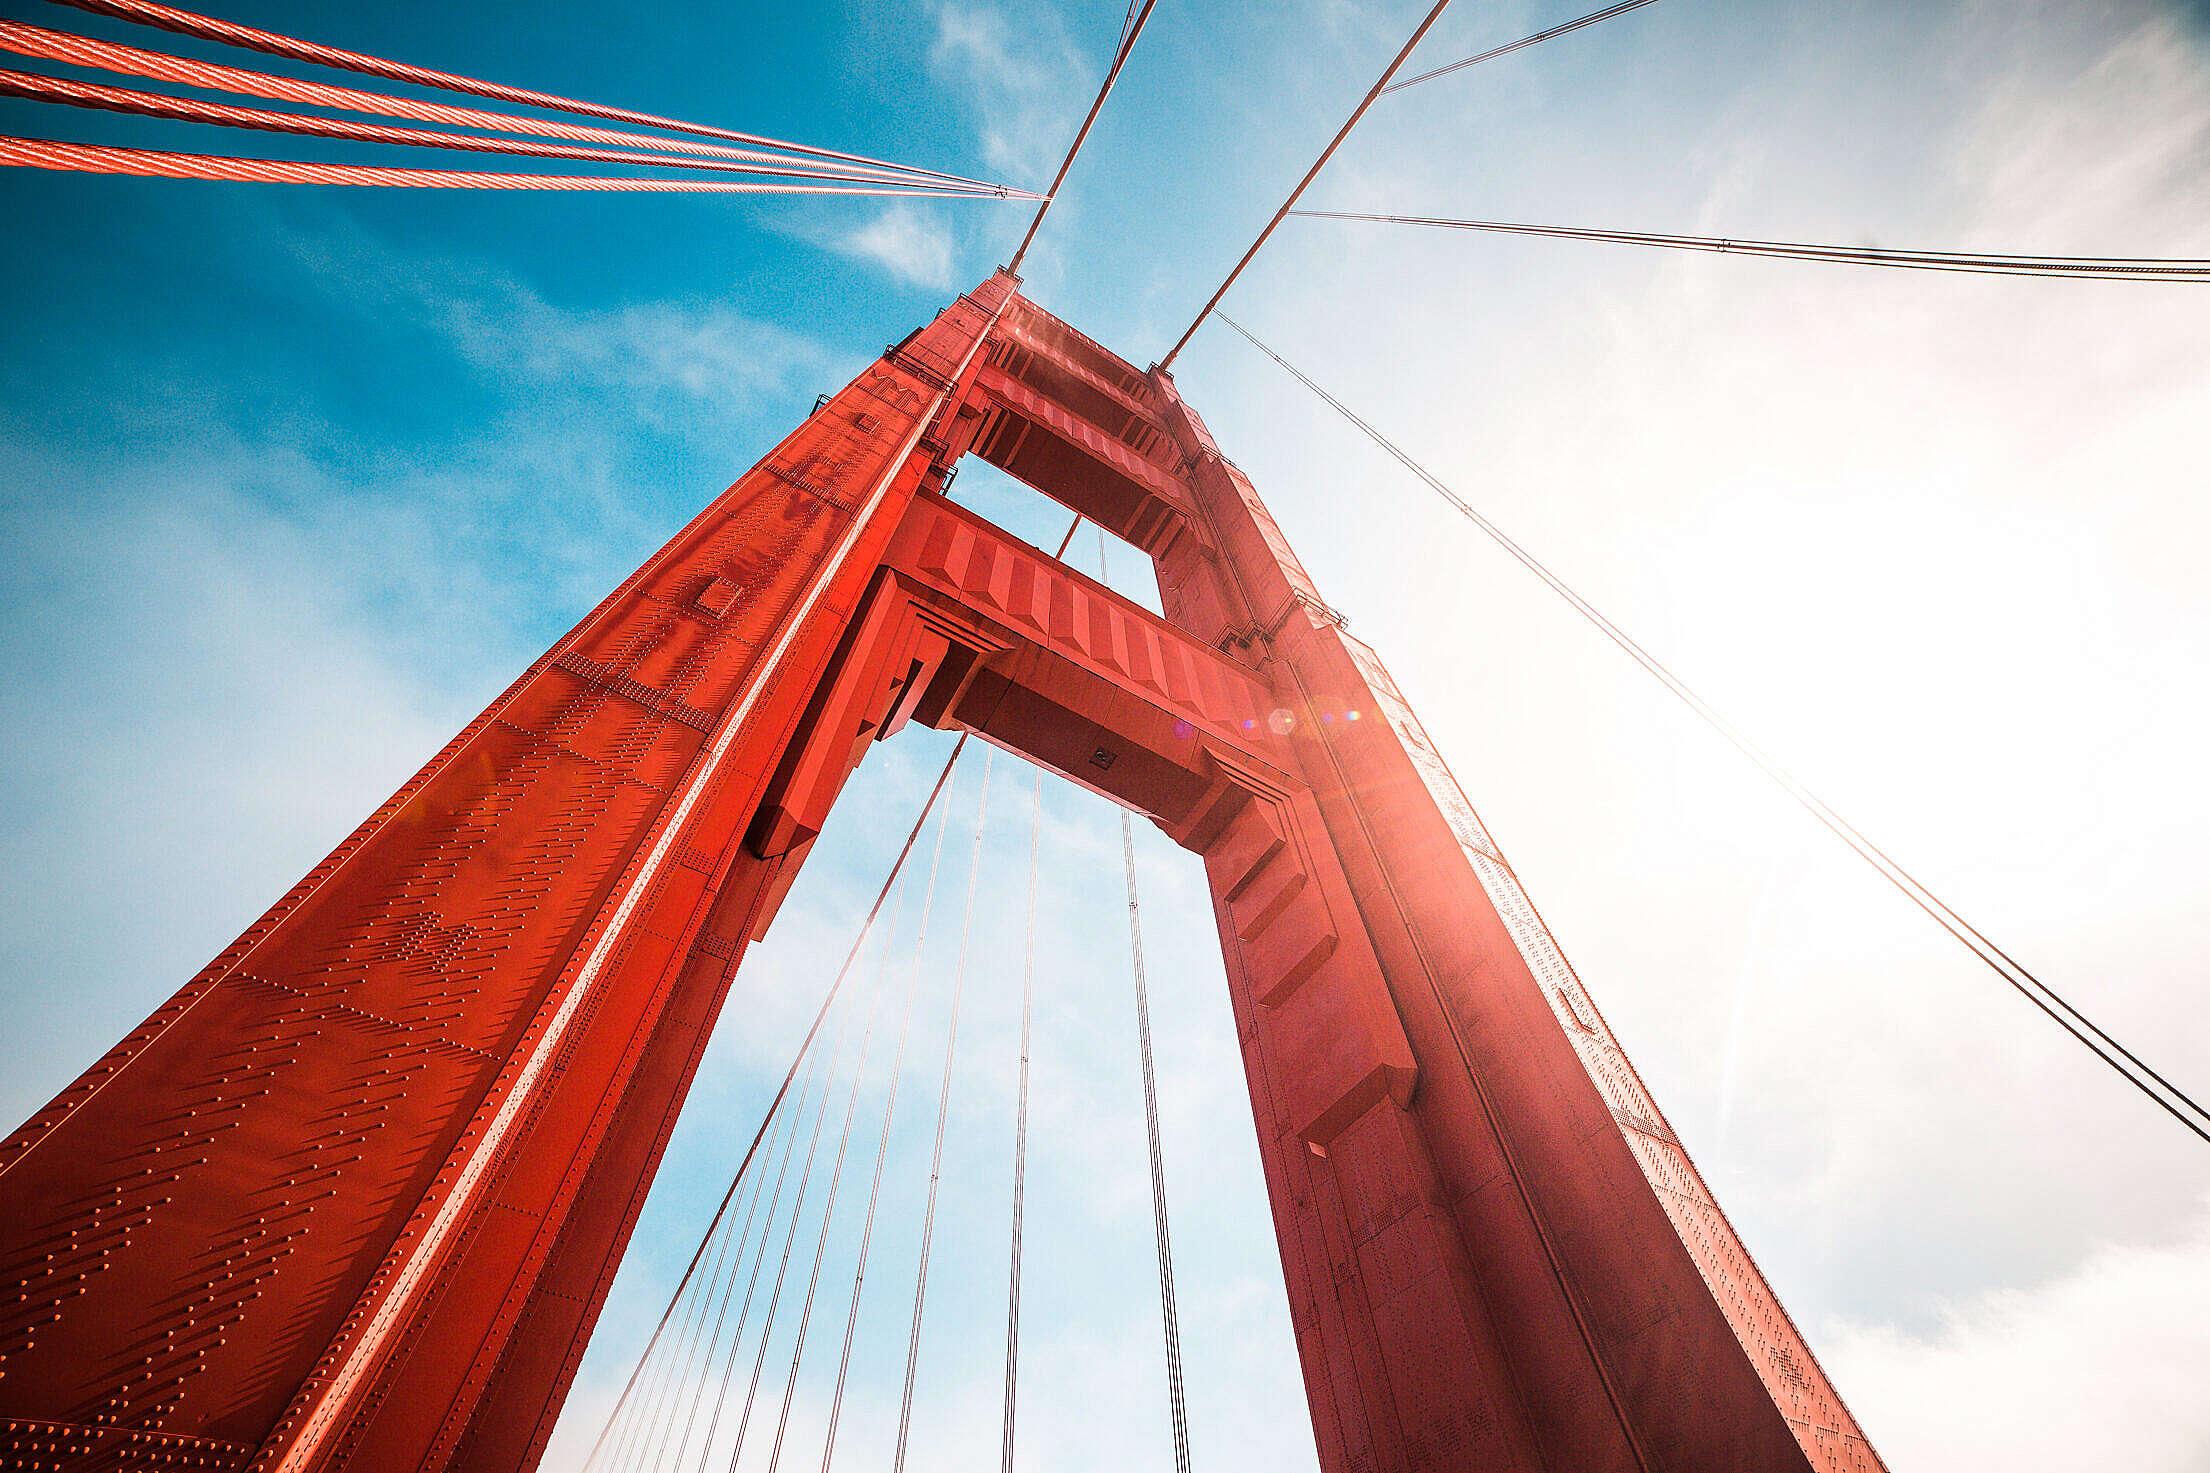 Golden Gate Bridge Free Stock Photo